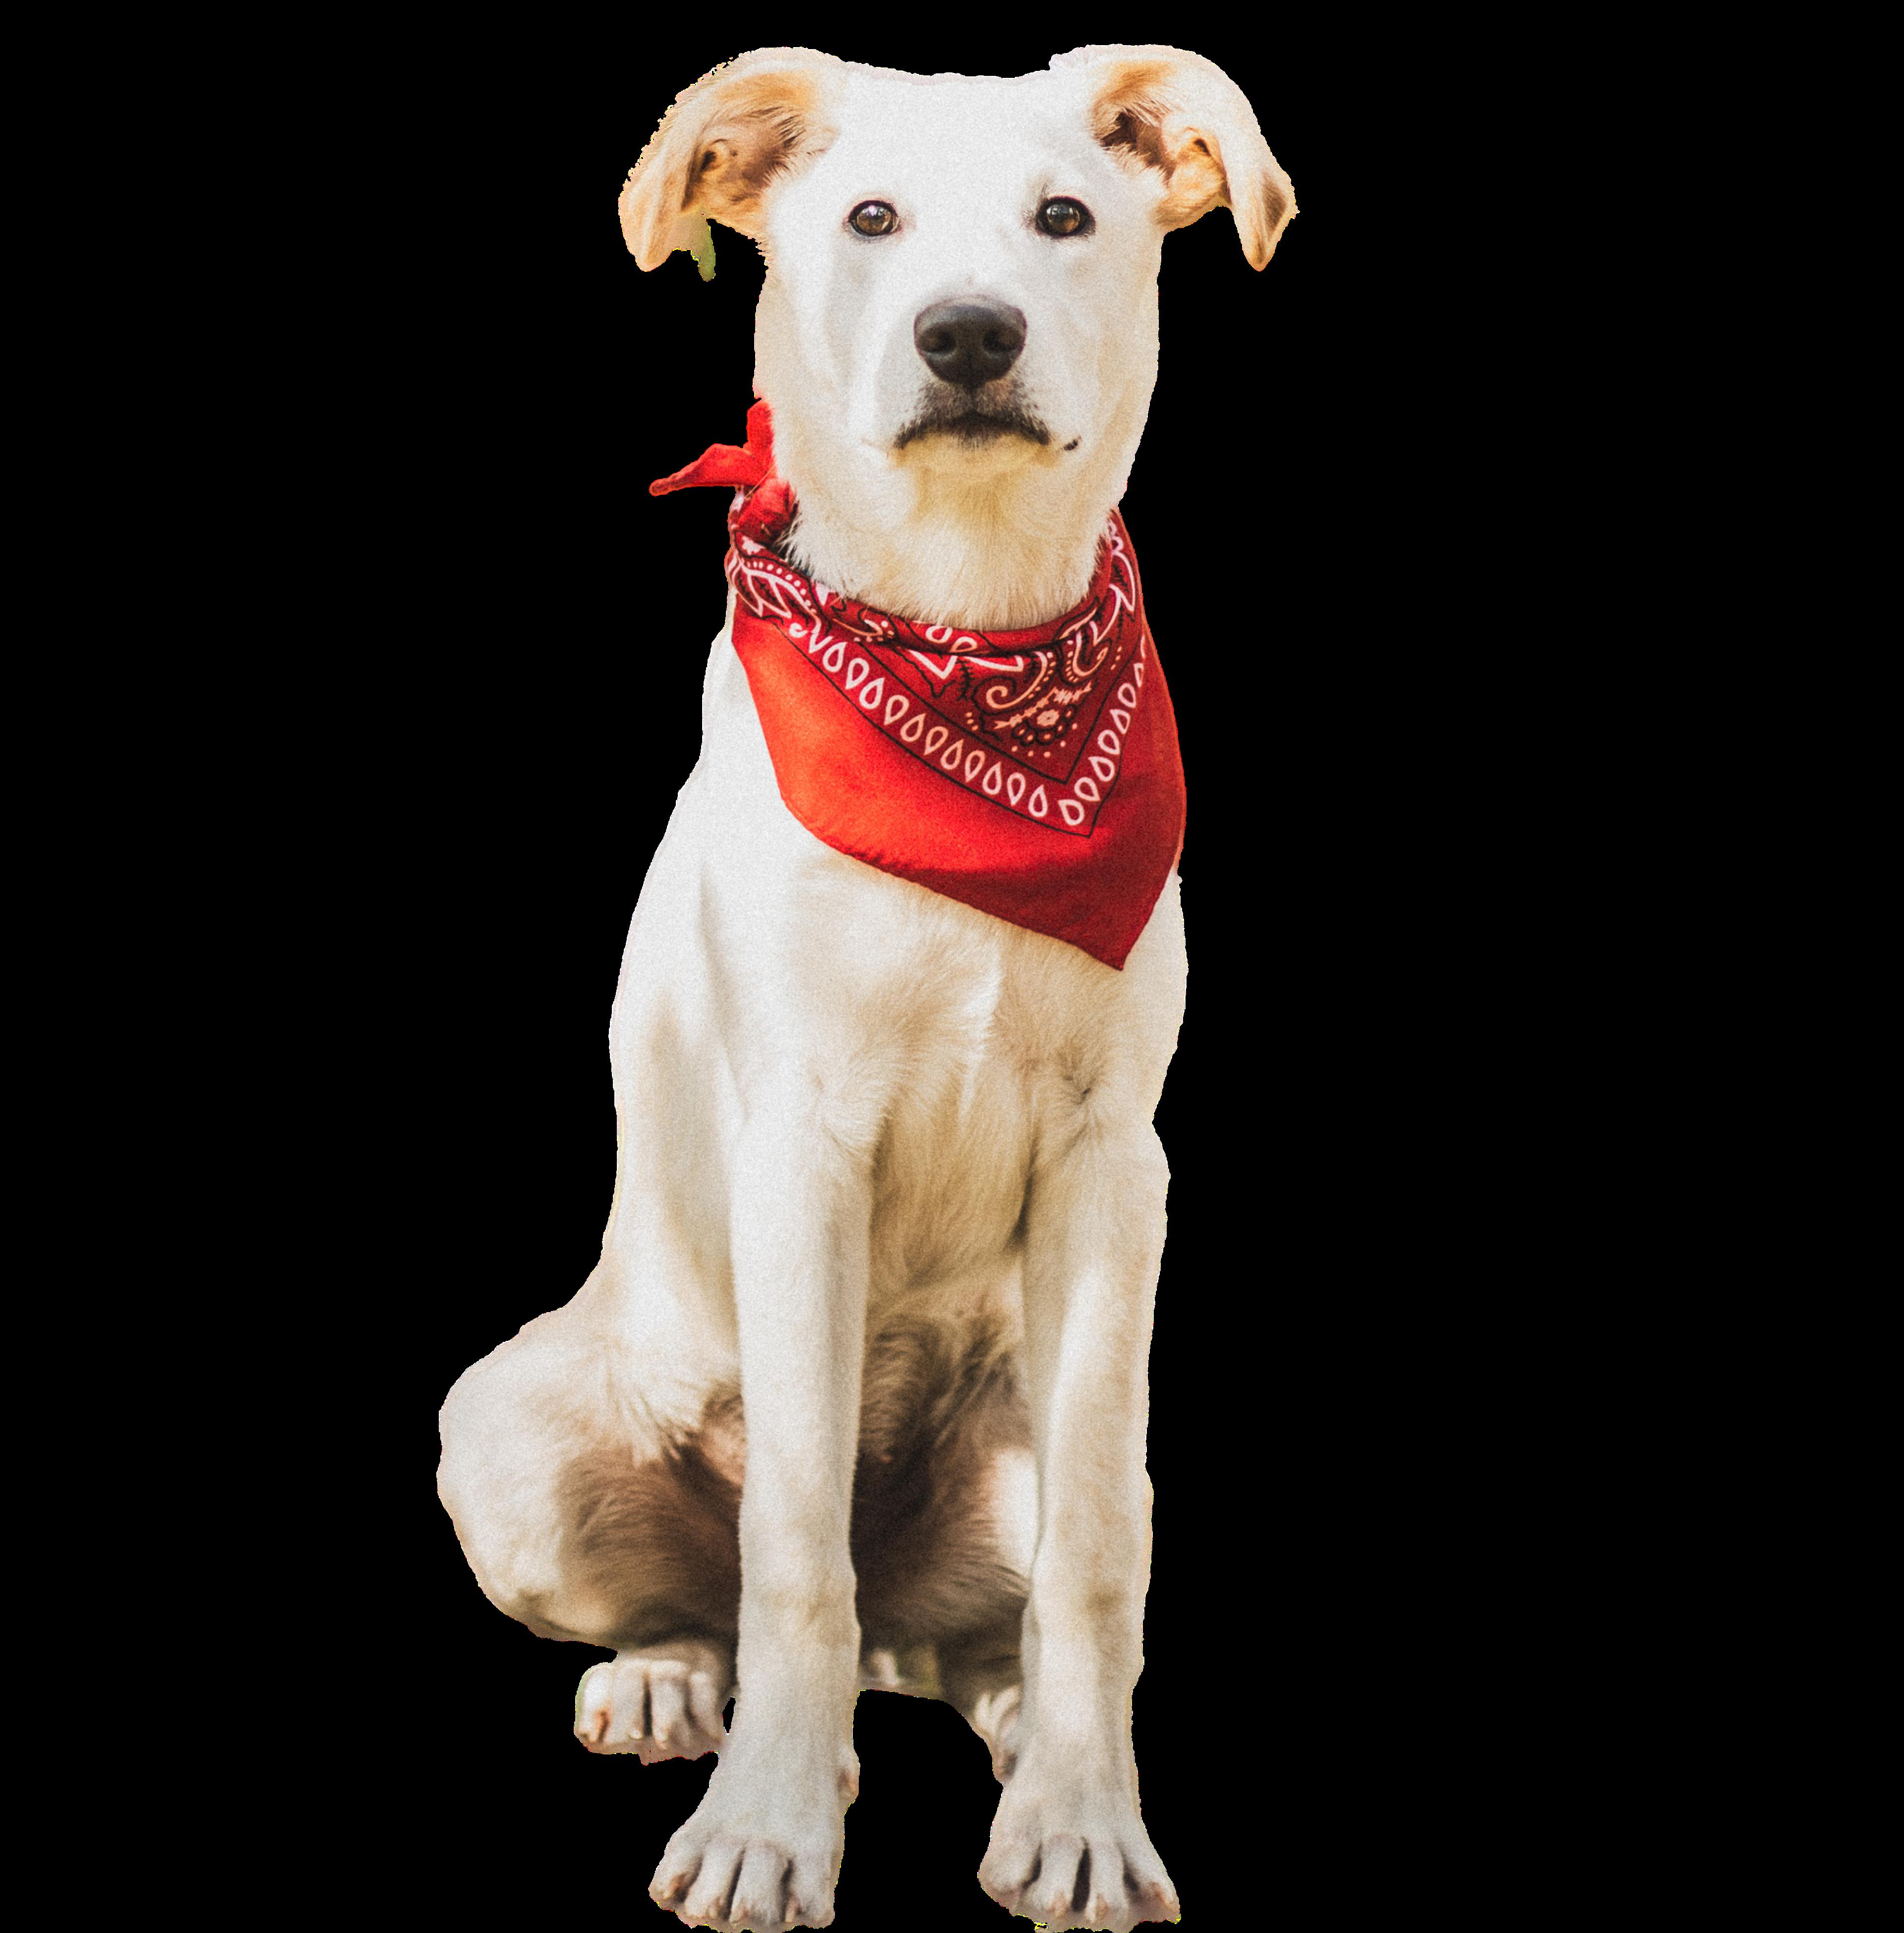 Loki the Webservices Dog